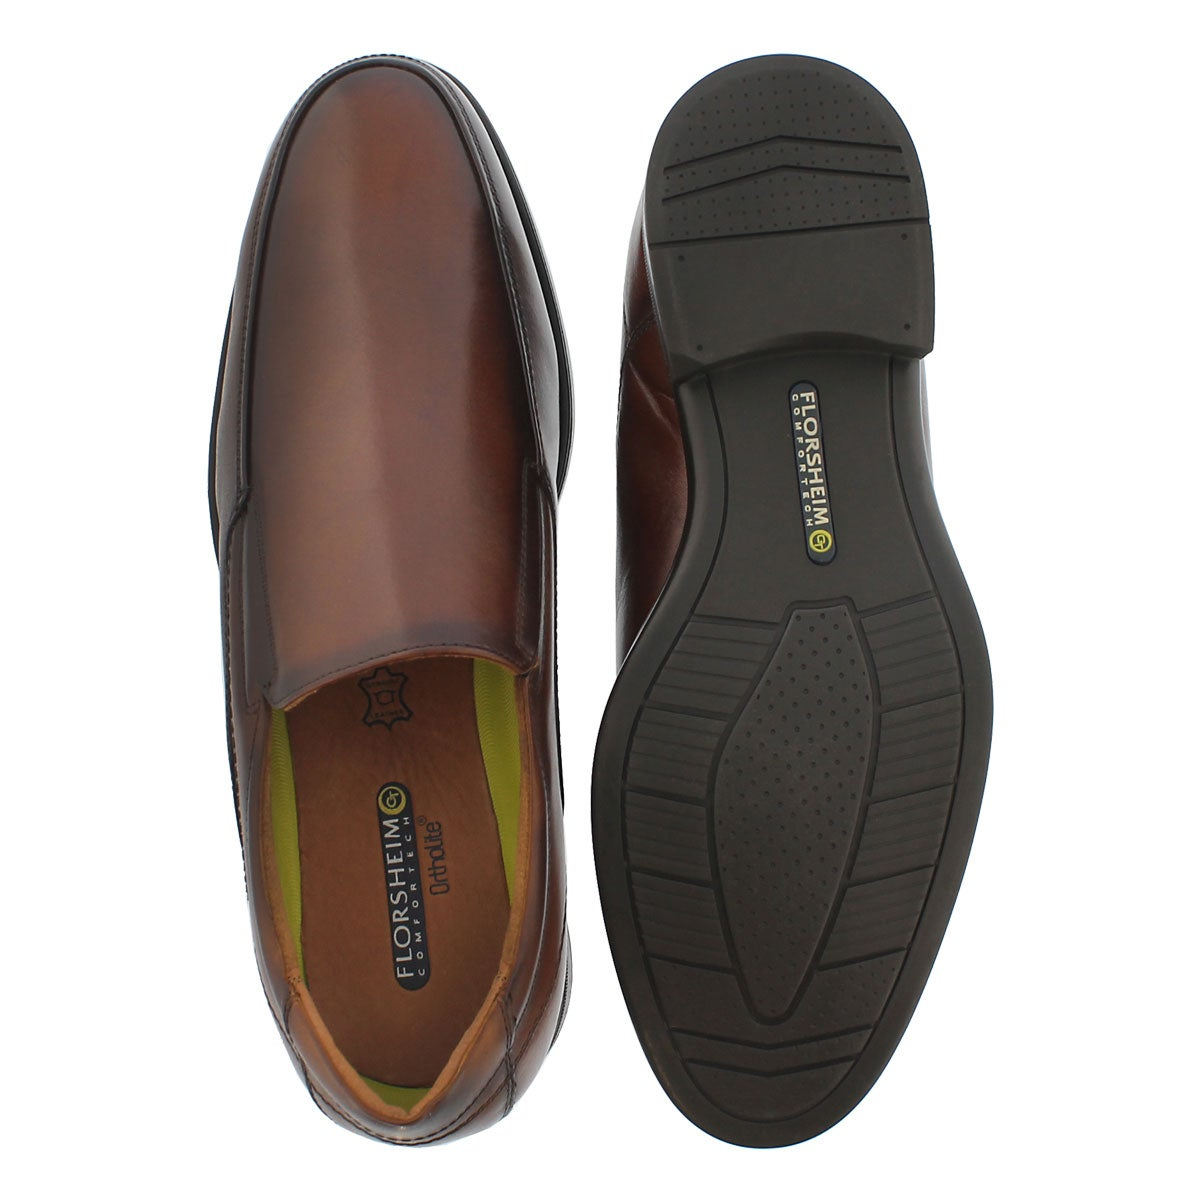 Chaussure hab MidtownMocSlip, cgc, hom-L